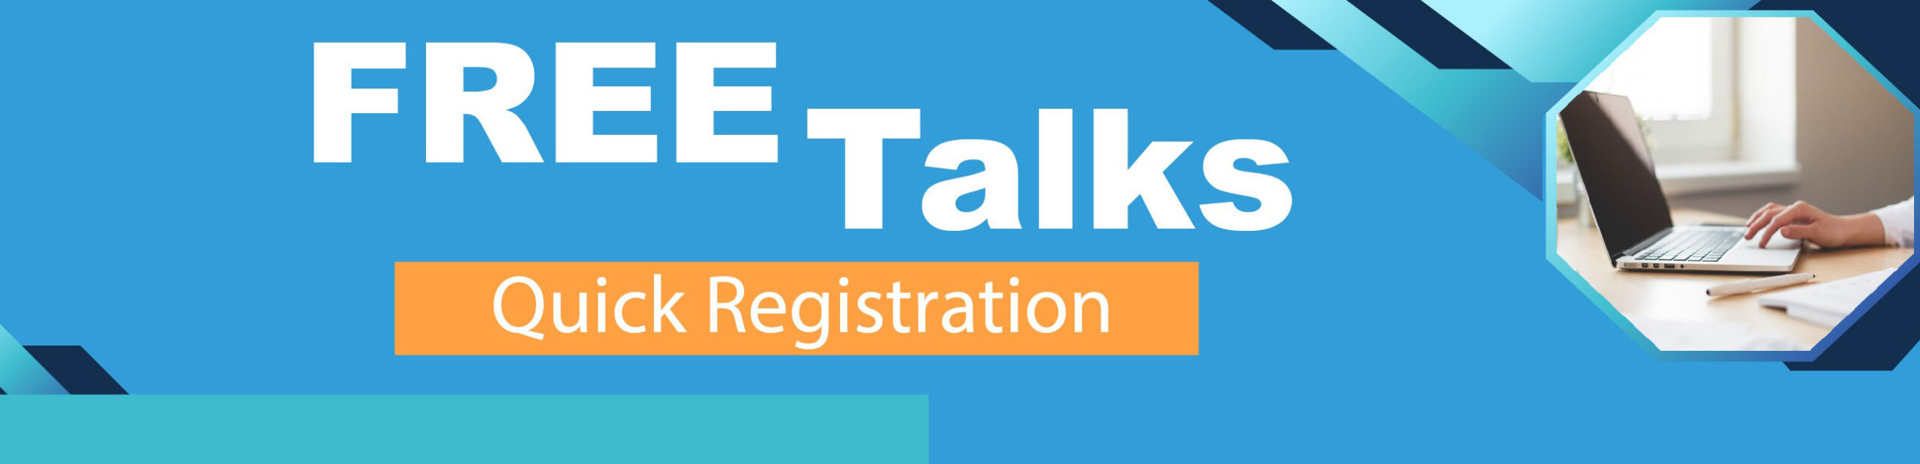 Free Talks Registration